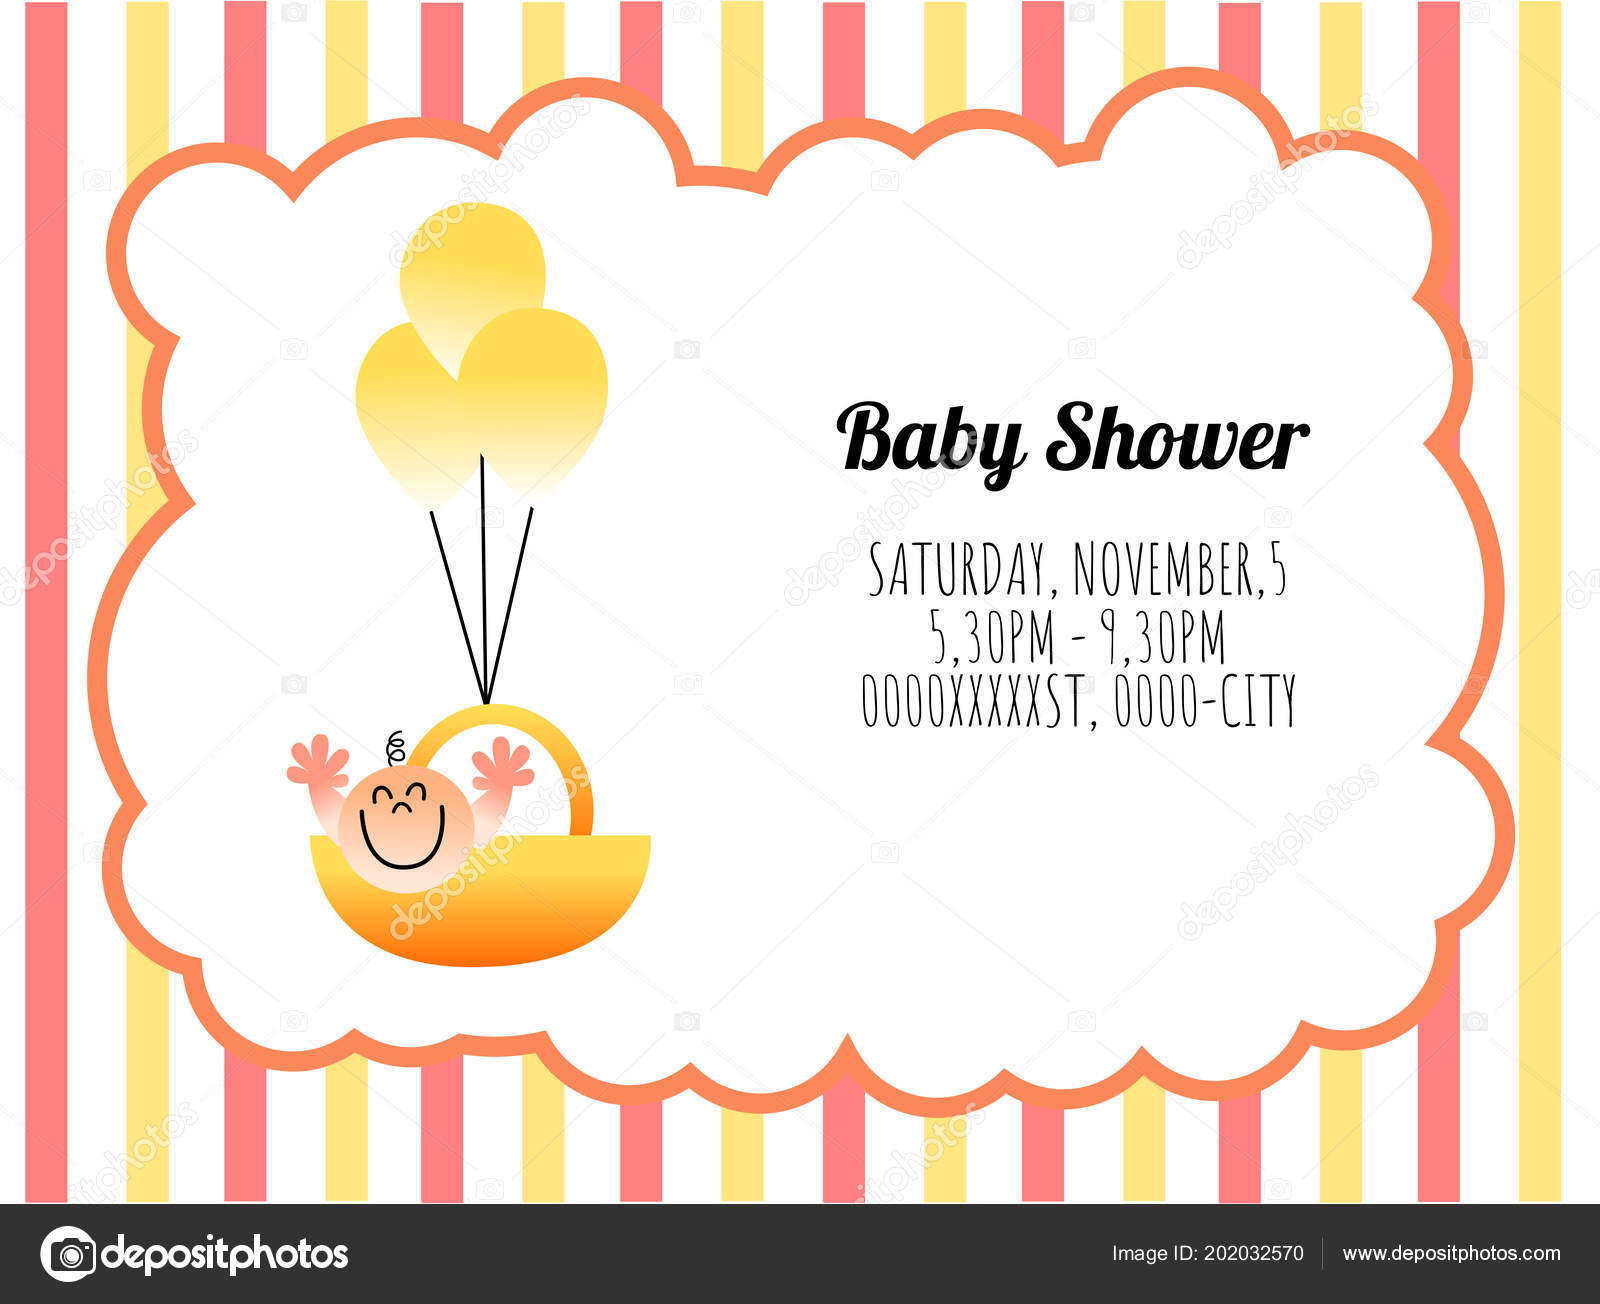 pretty template card invitation baby shower ストックベクター